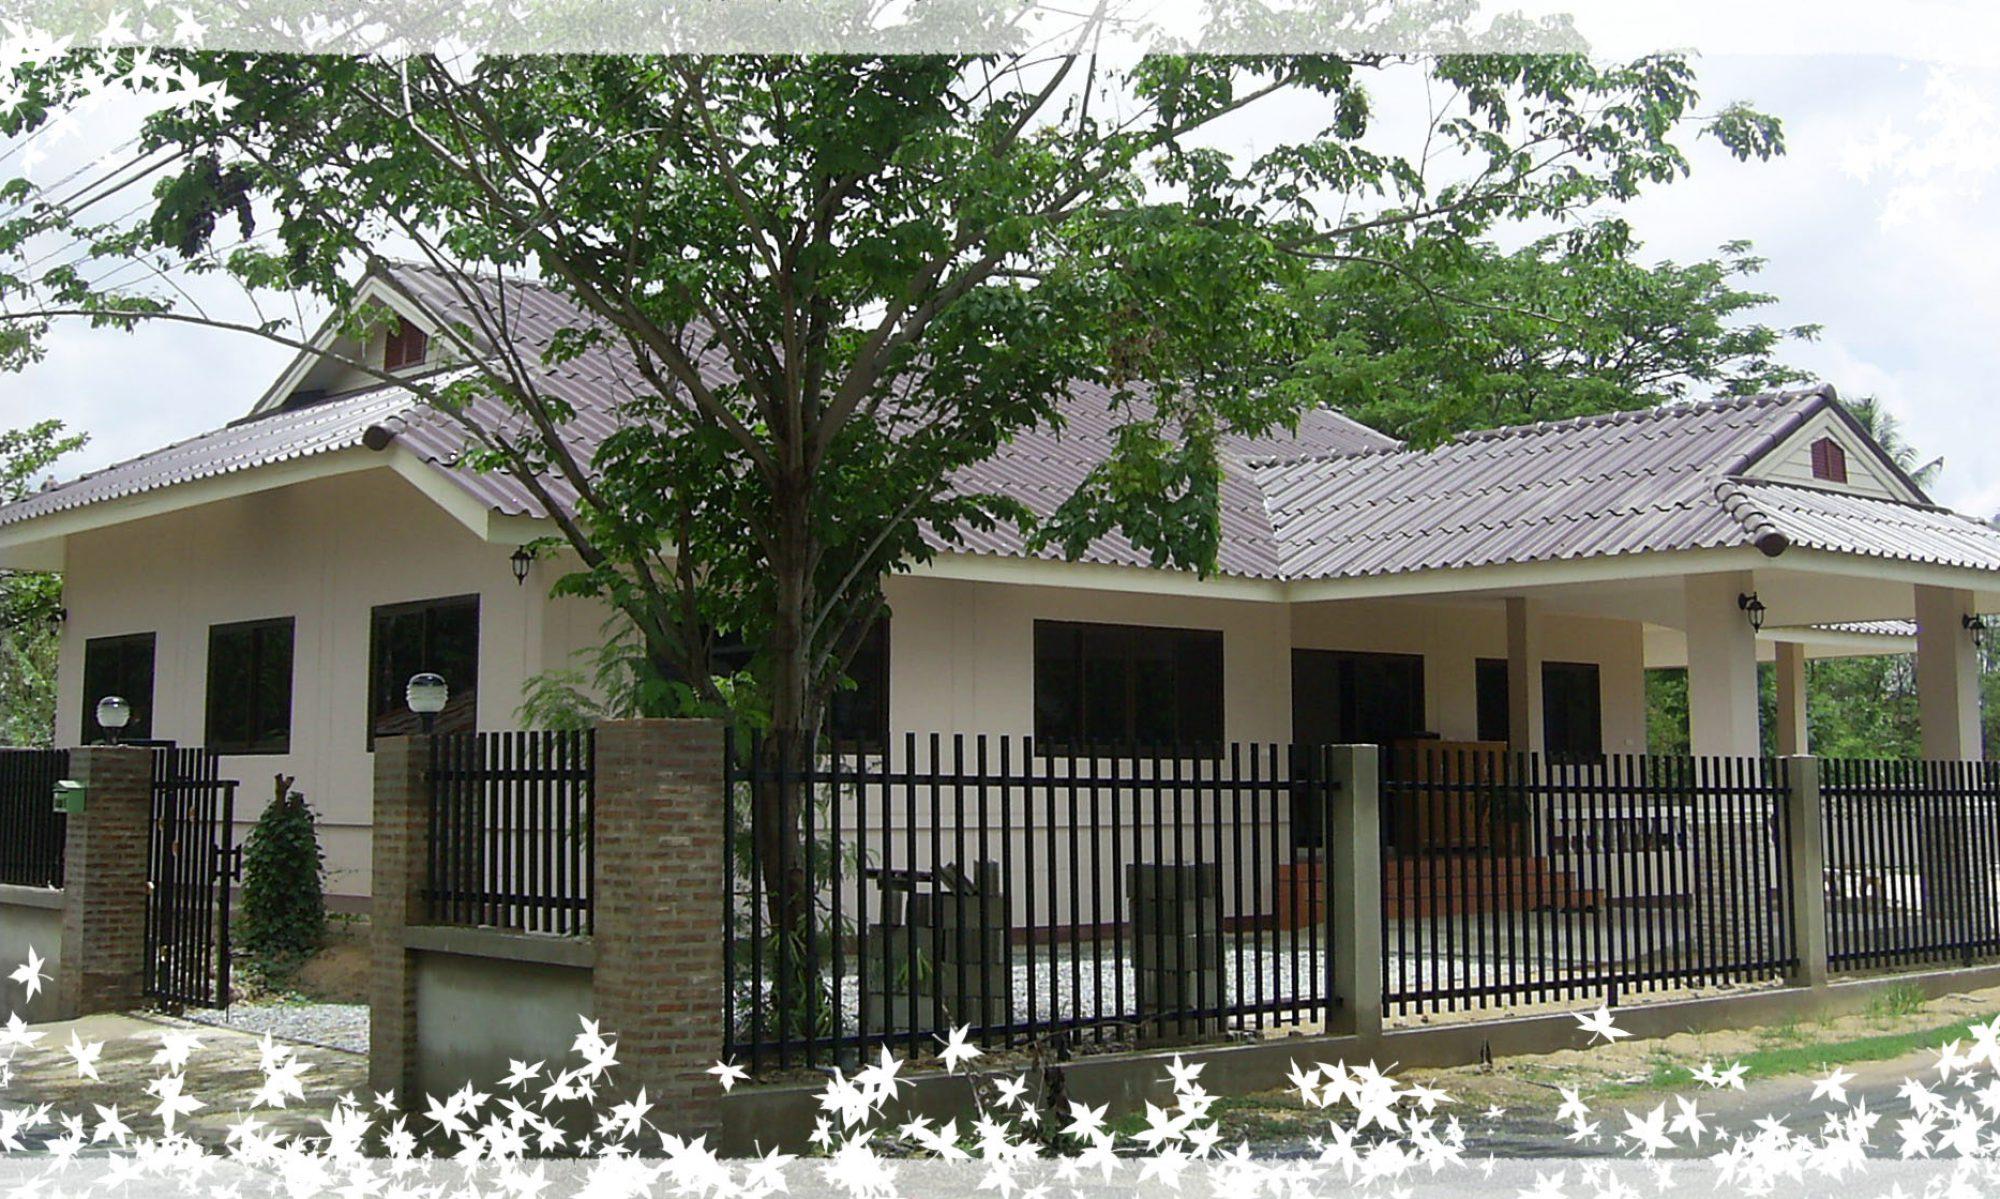 ACT :: องค์การคริสตจักรสัมพันธ์ในประเทศไทย